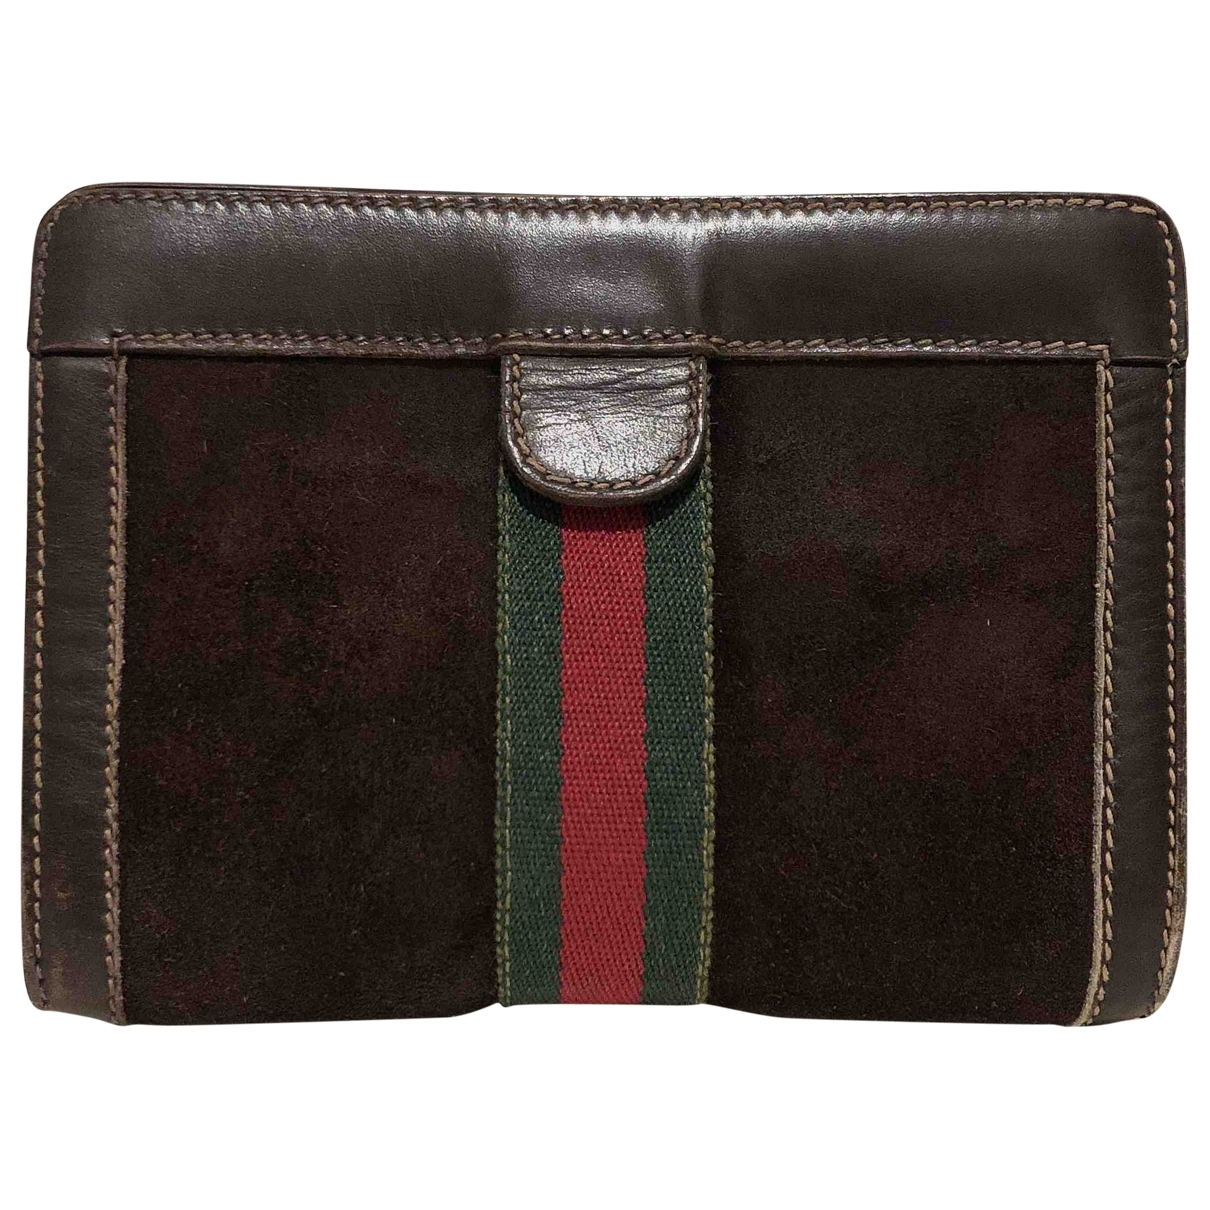 Gucci \N Brown Suede Clutch bag for Women \N